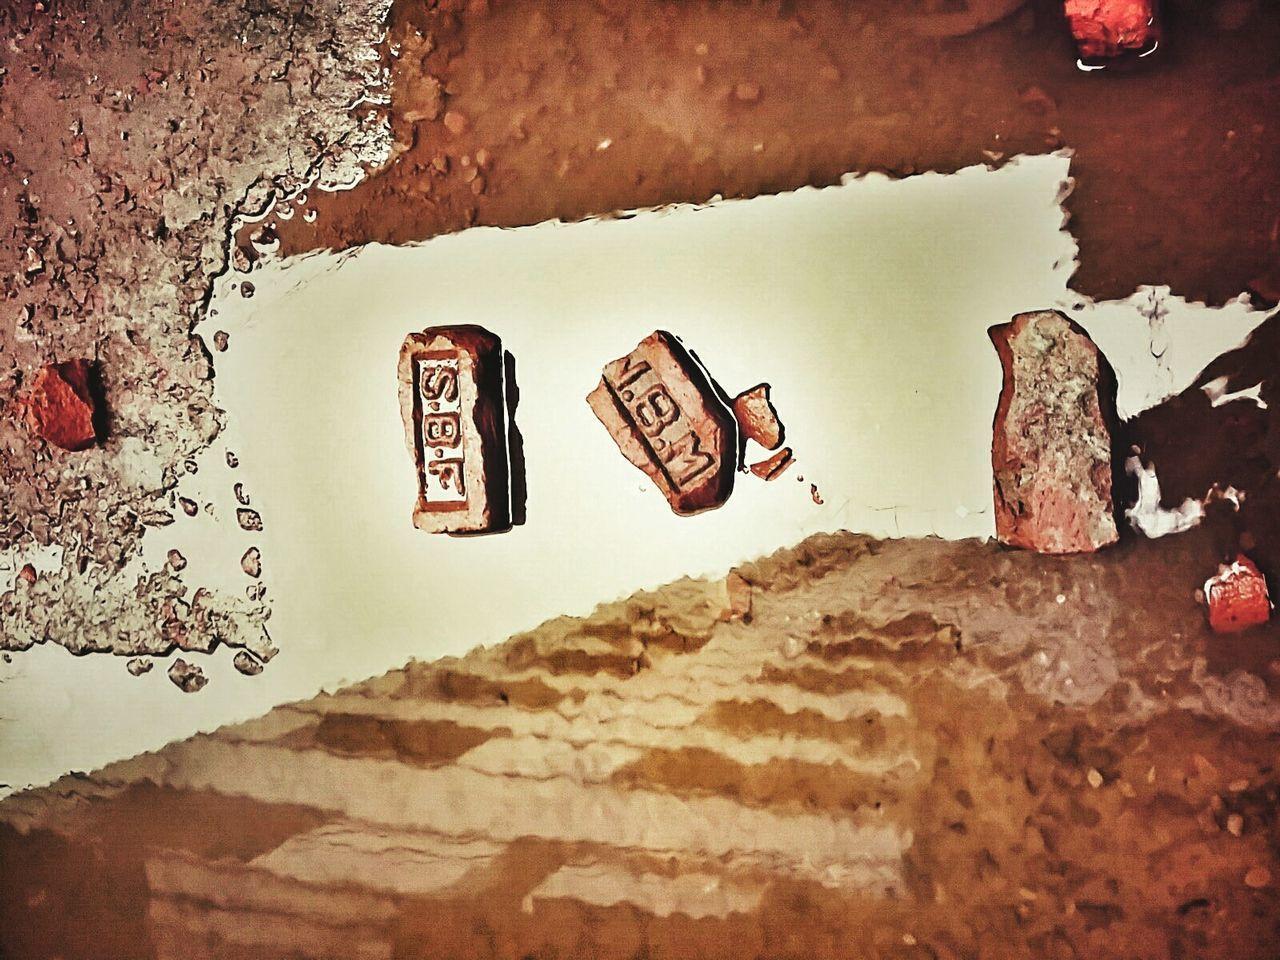 Brickstones Reflection Outdoors Rainy Days Broken Bricks Nature Pattern Mobile Photography Bangladesh The Week Of Eyeem EyeEm Diversity The Secret Spaces Art Is Everywhere Building Reflections ミーノー!! EyeEmNewHere The Street Photographer - 2017 EyeEm Awards BYOPaper!